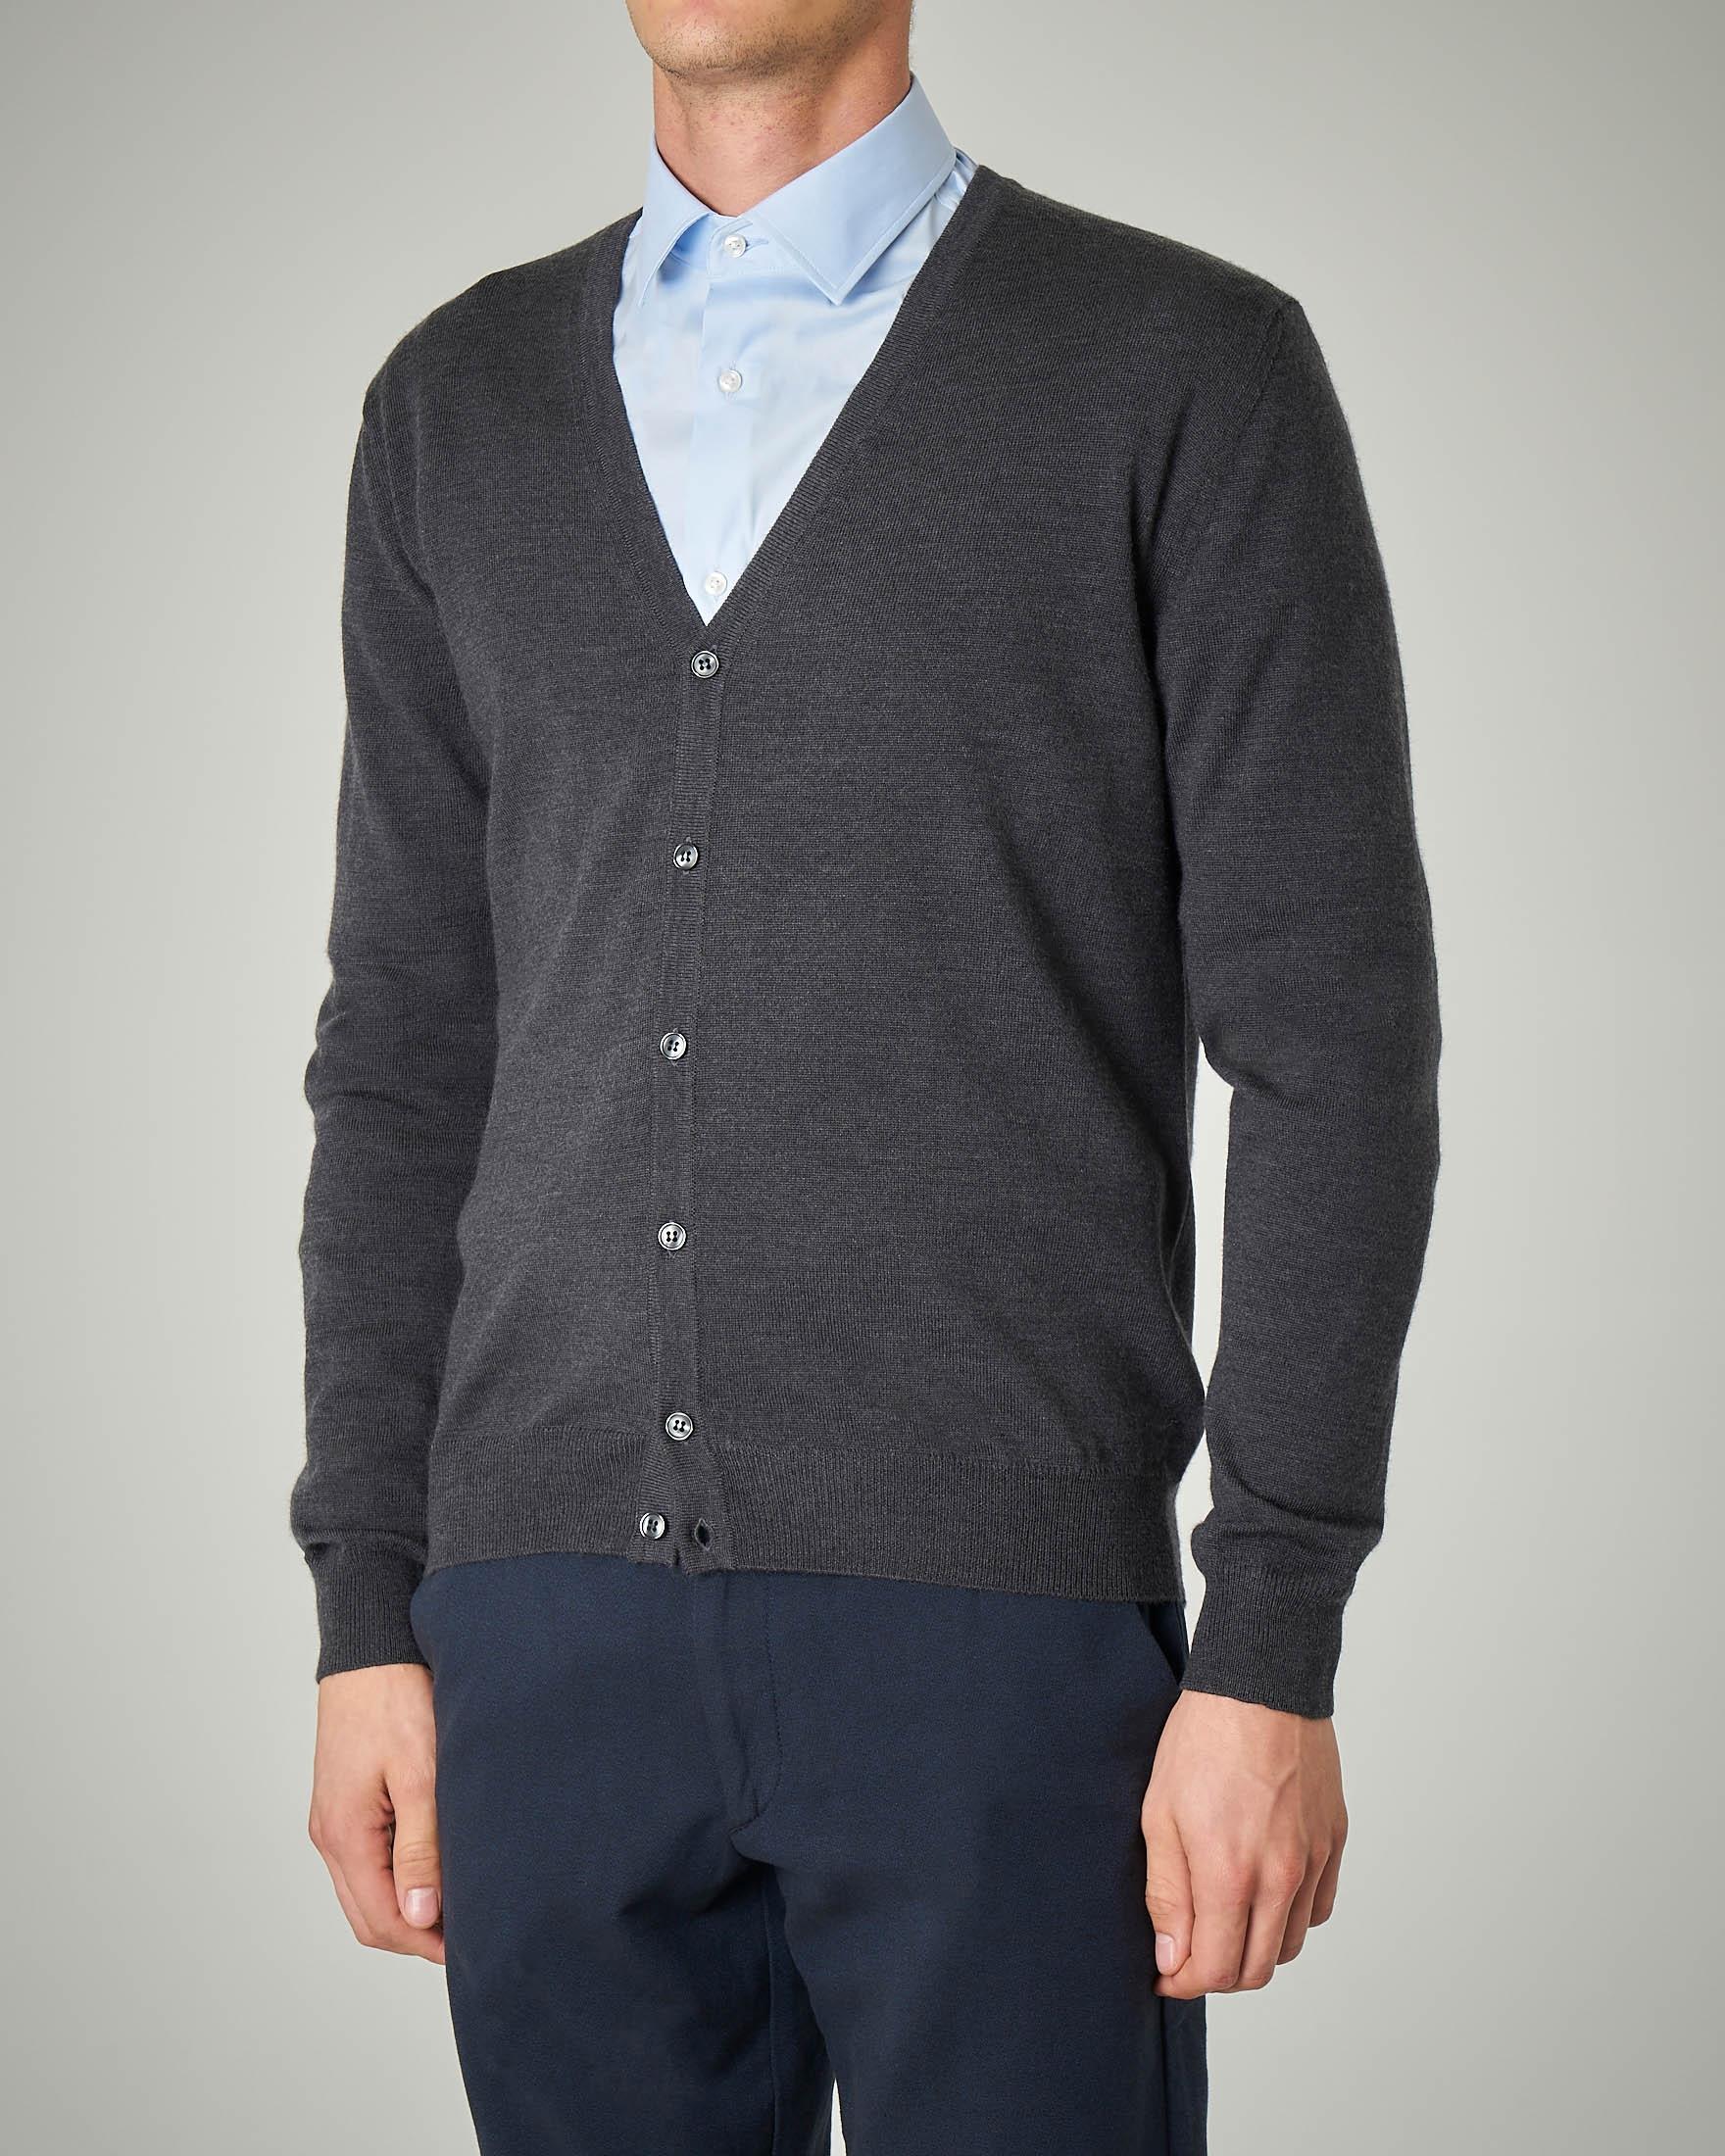 Cardigan antracite in lana merino